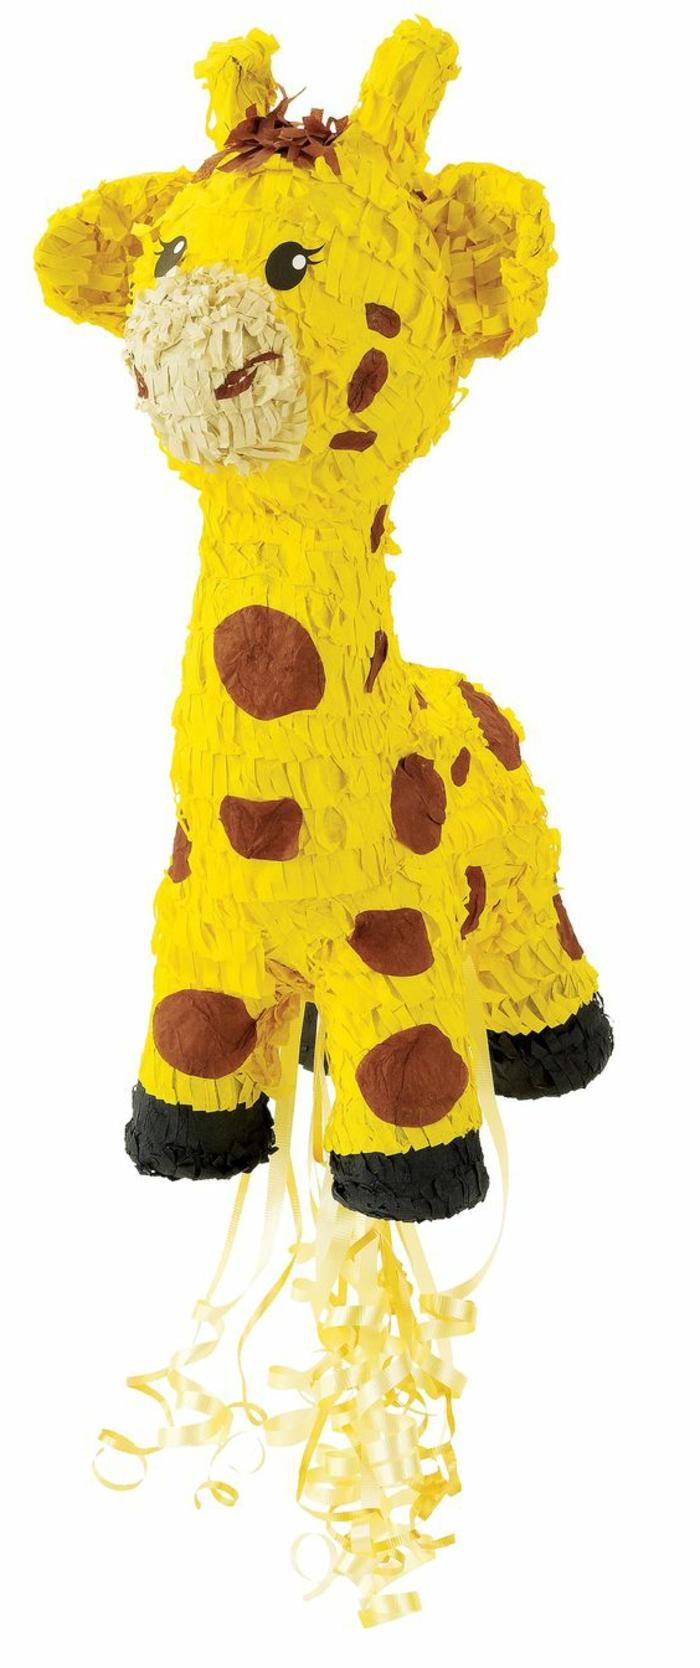 pinata-giraffe, gelbe schleife, papier, kinderparty